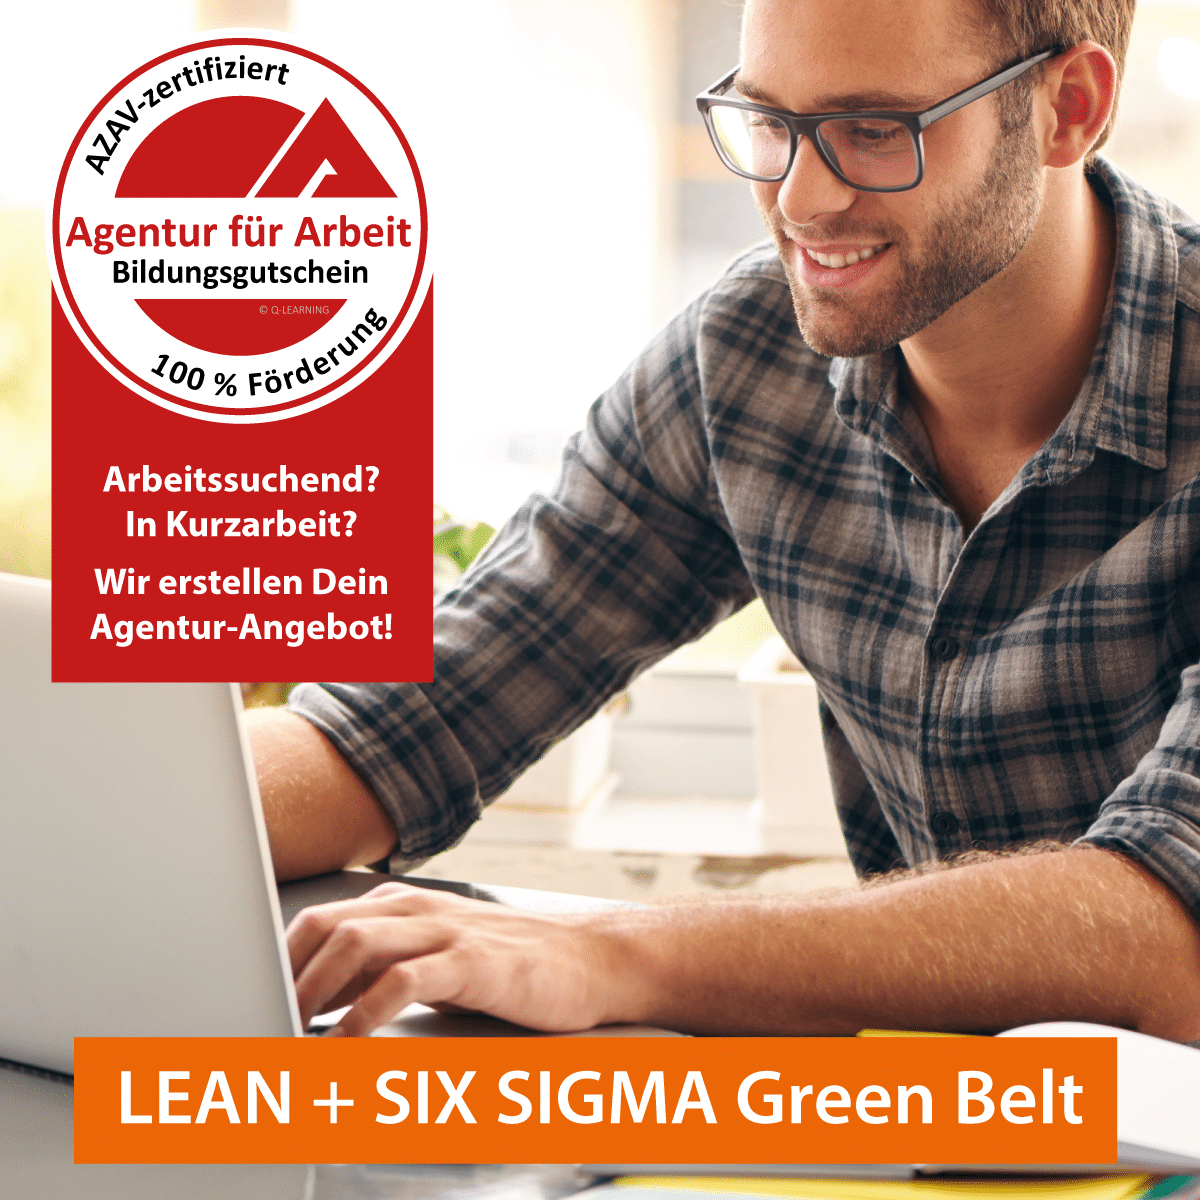 LEAN SIX SIGMA Green Belt AZAV Bildungsgutschein